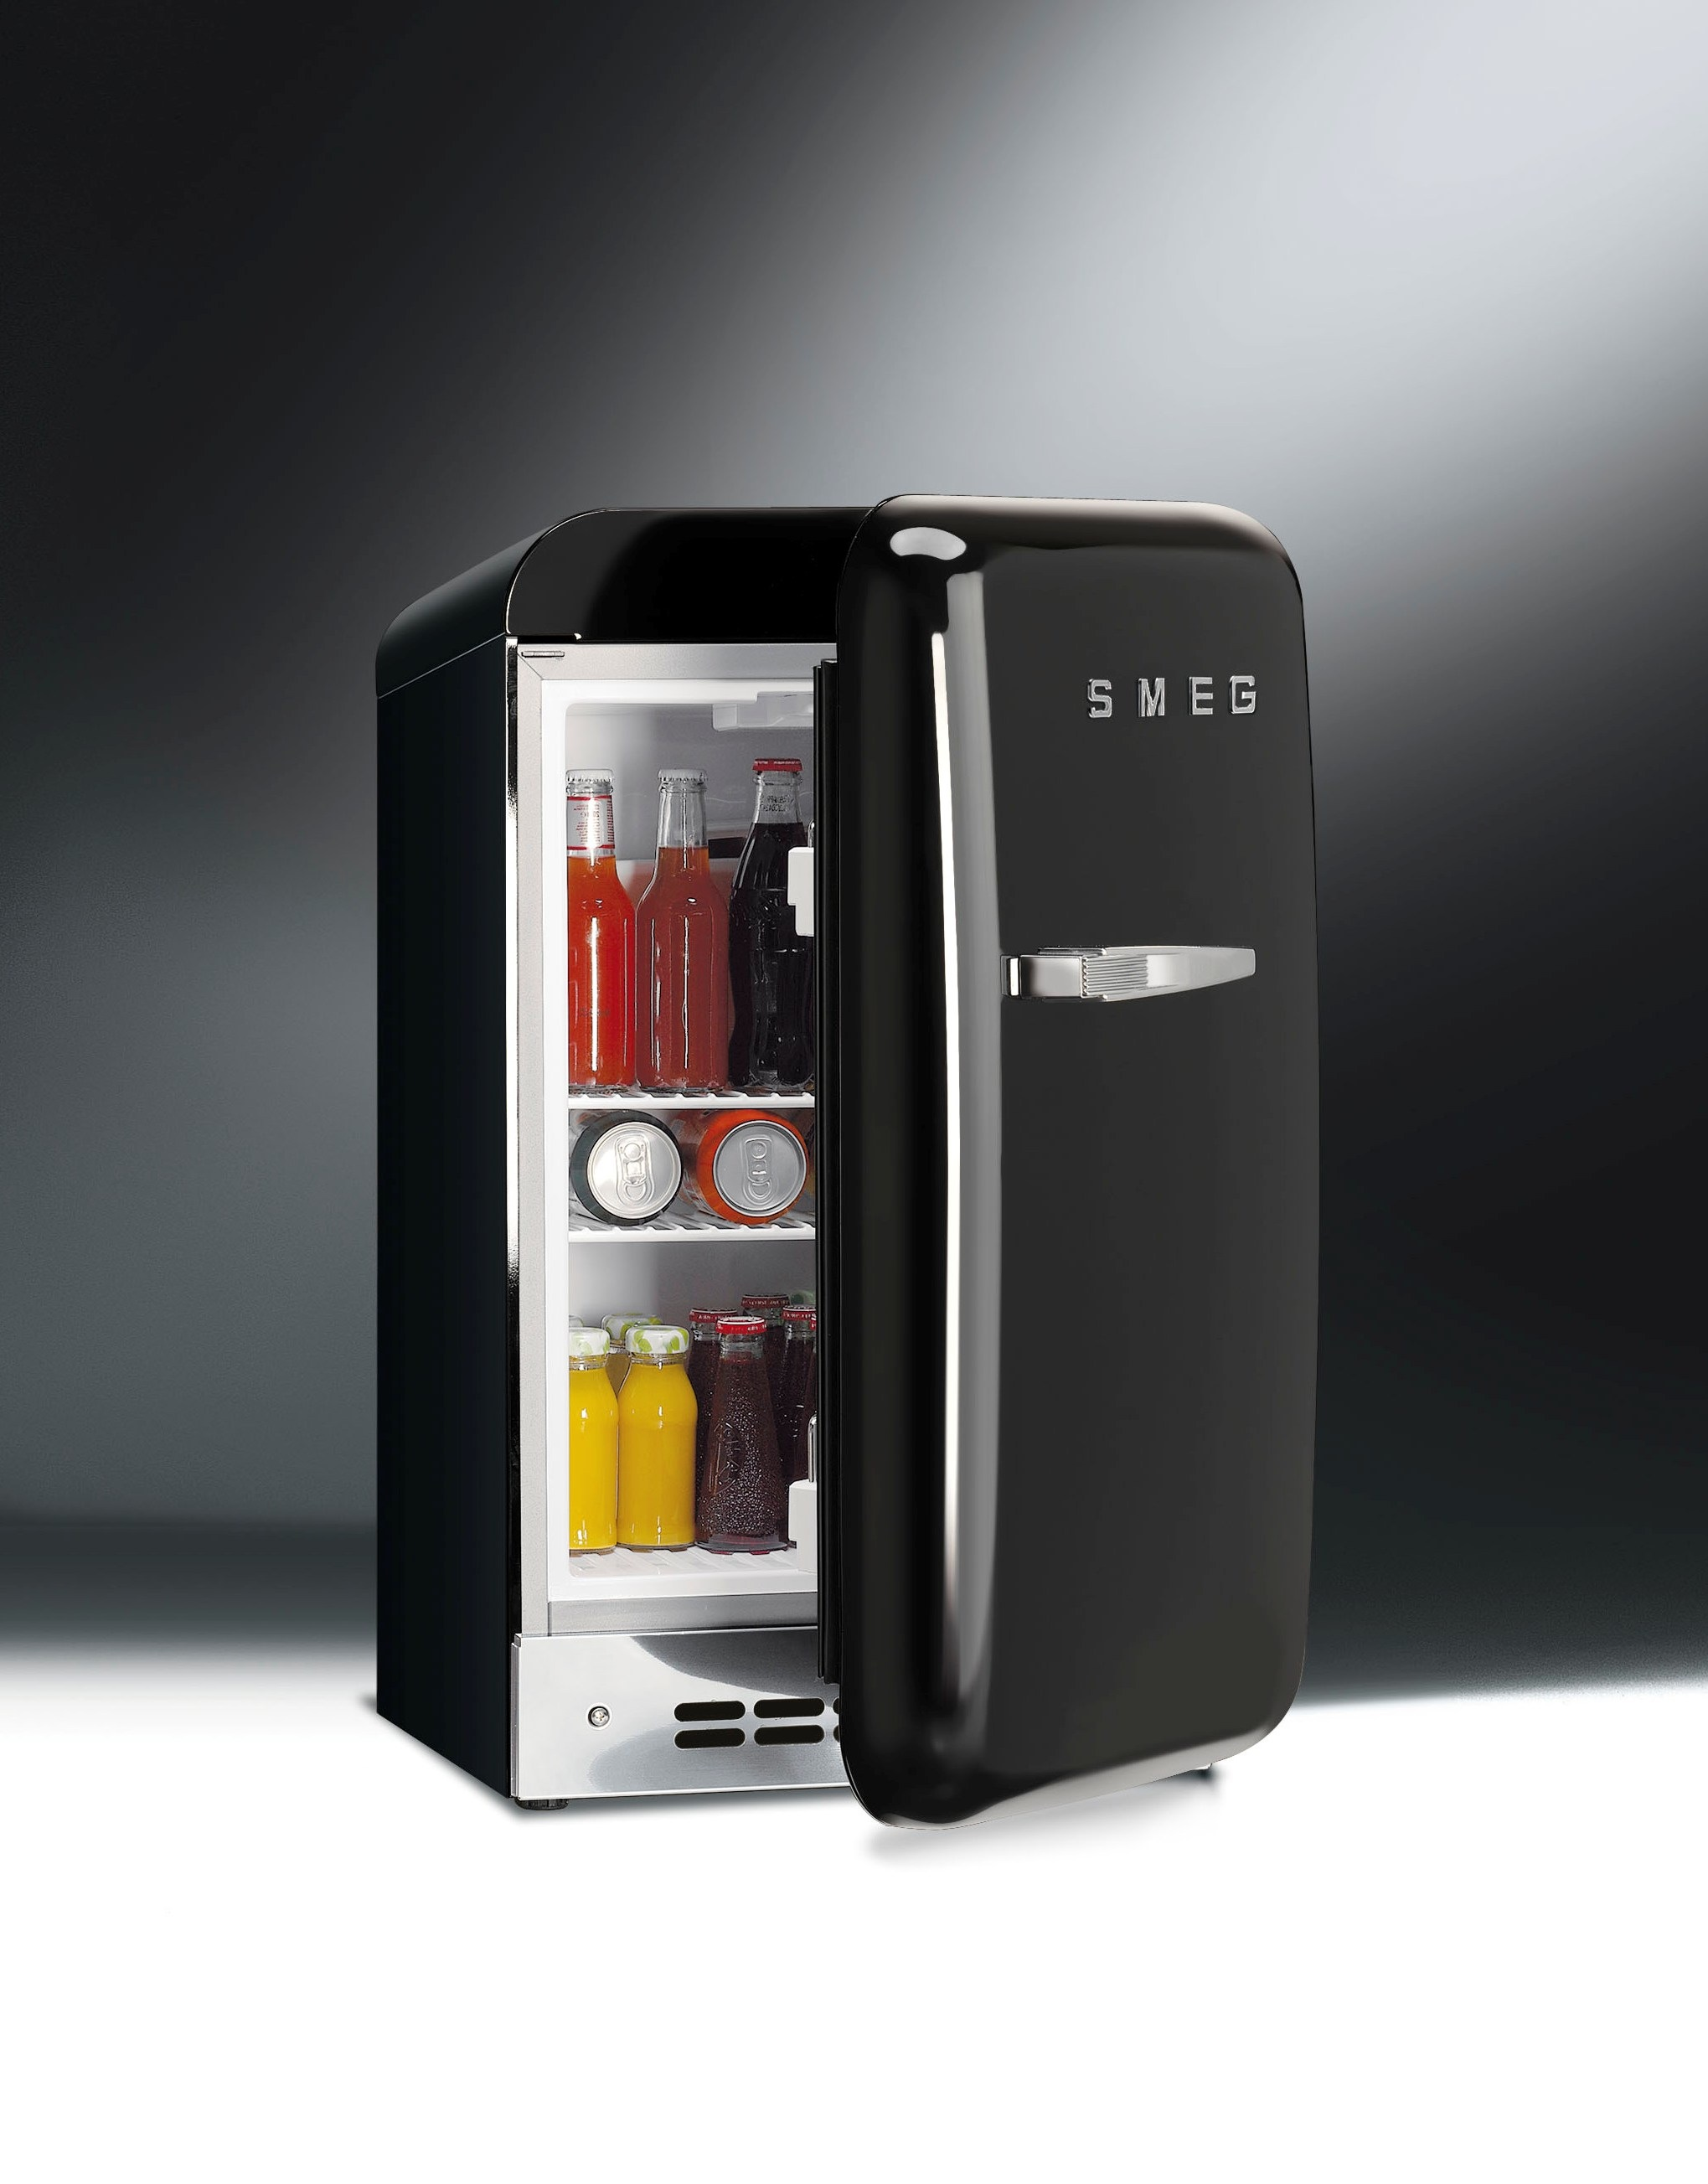 FAB5 mini koelkast van Smeg #koelkast #keuken